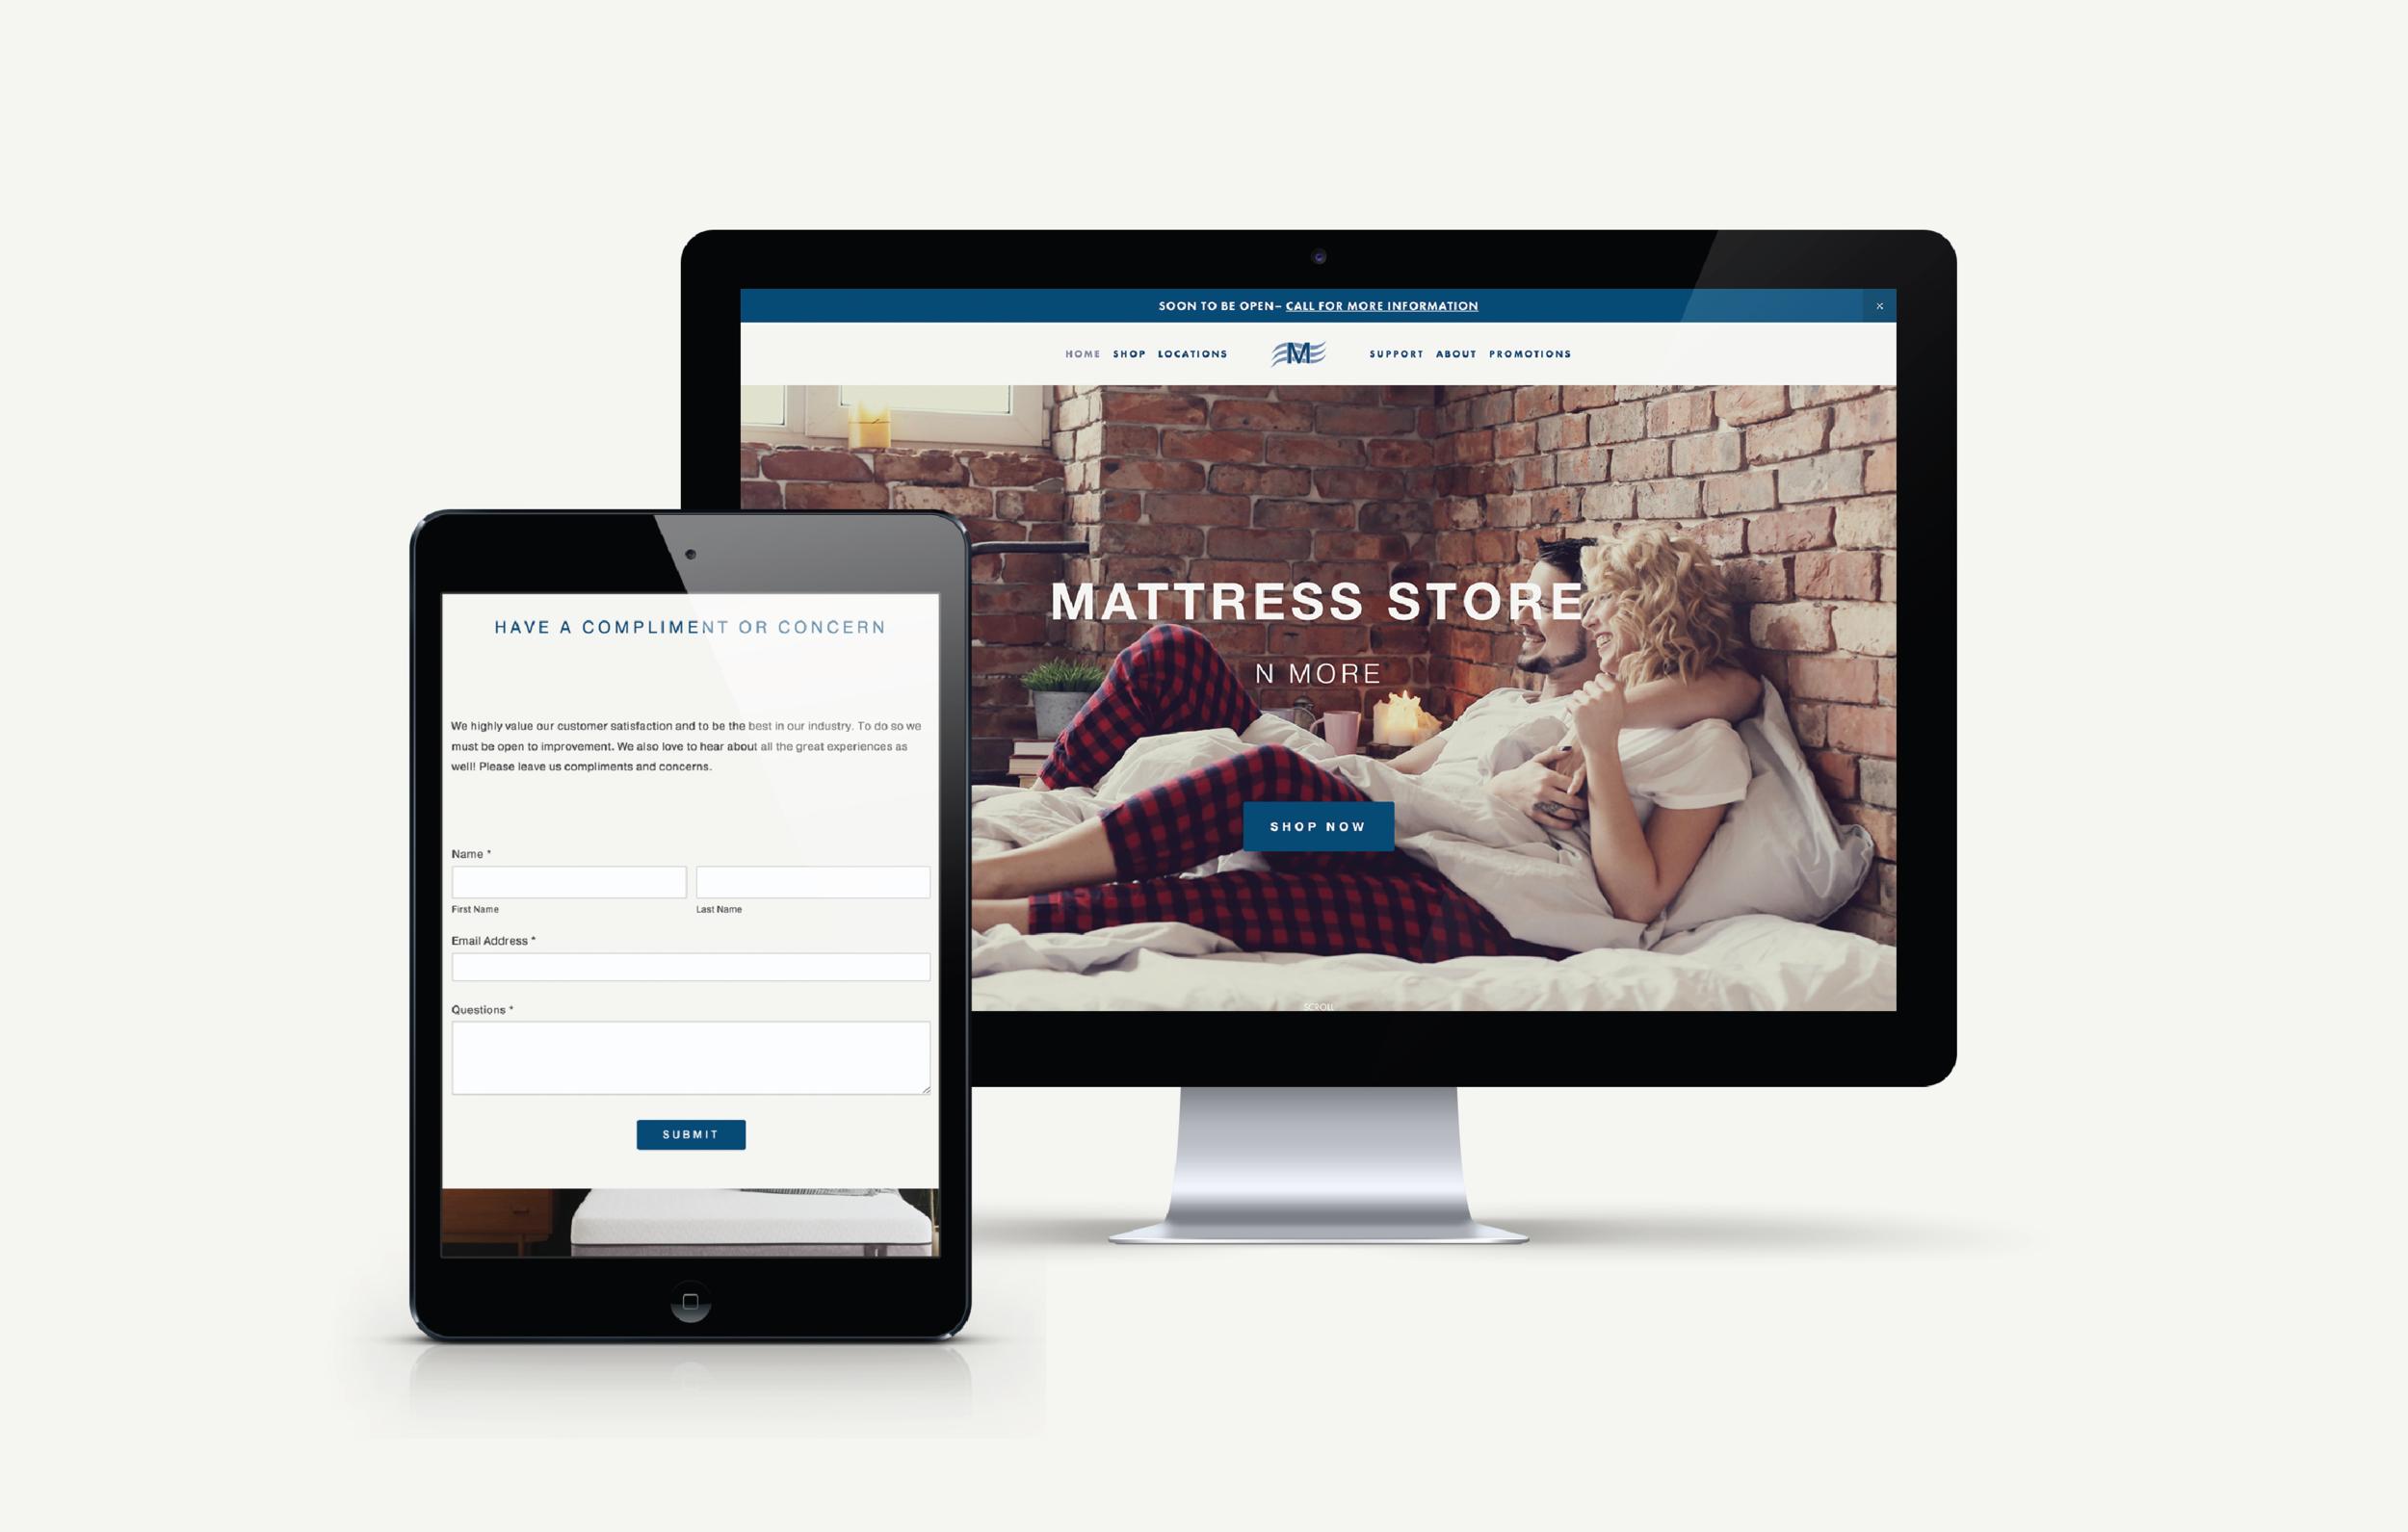 MattressStoreNMore_mockups-04.png